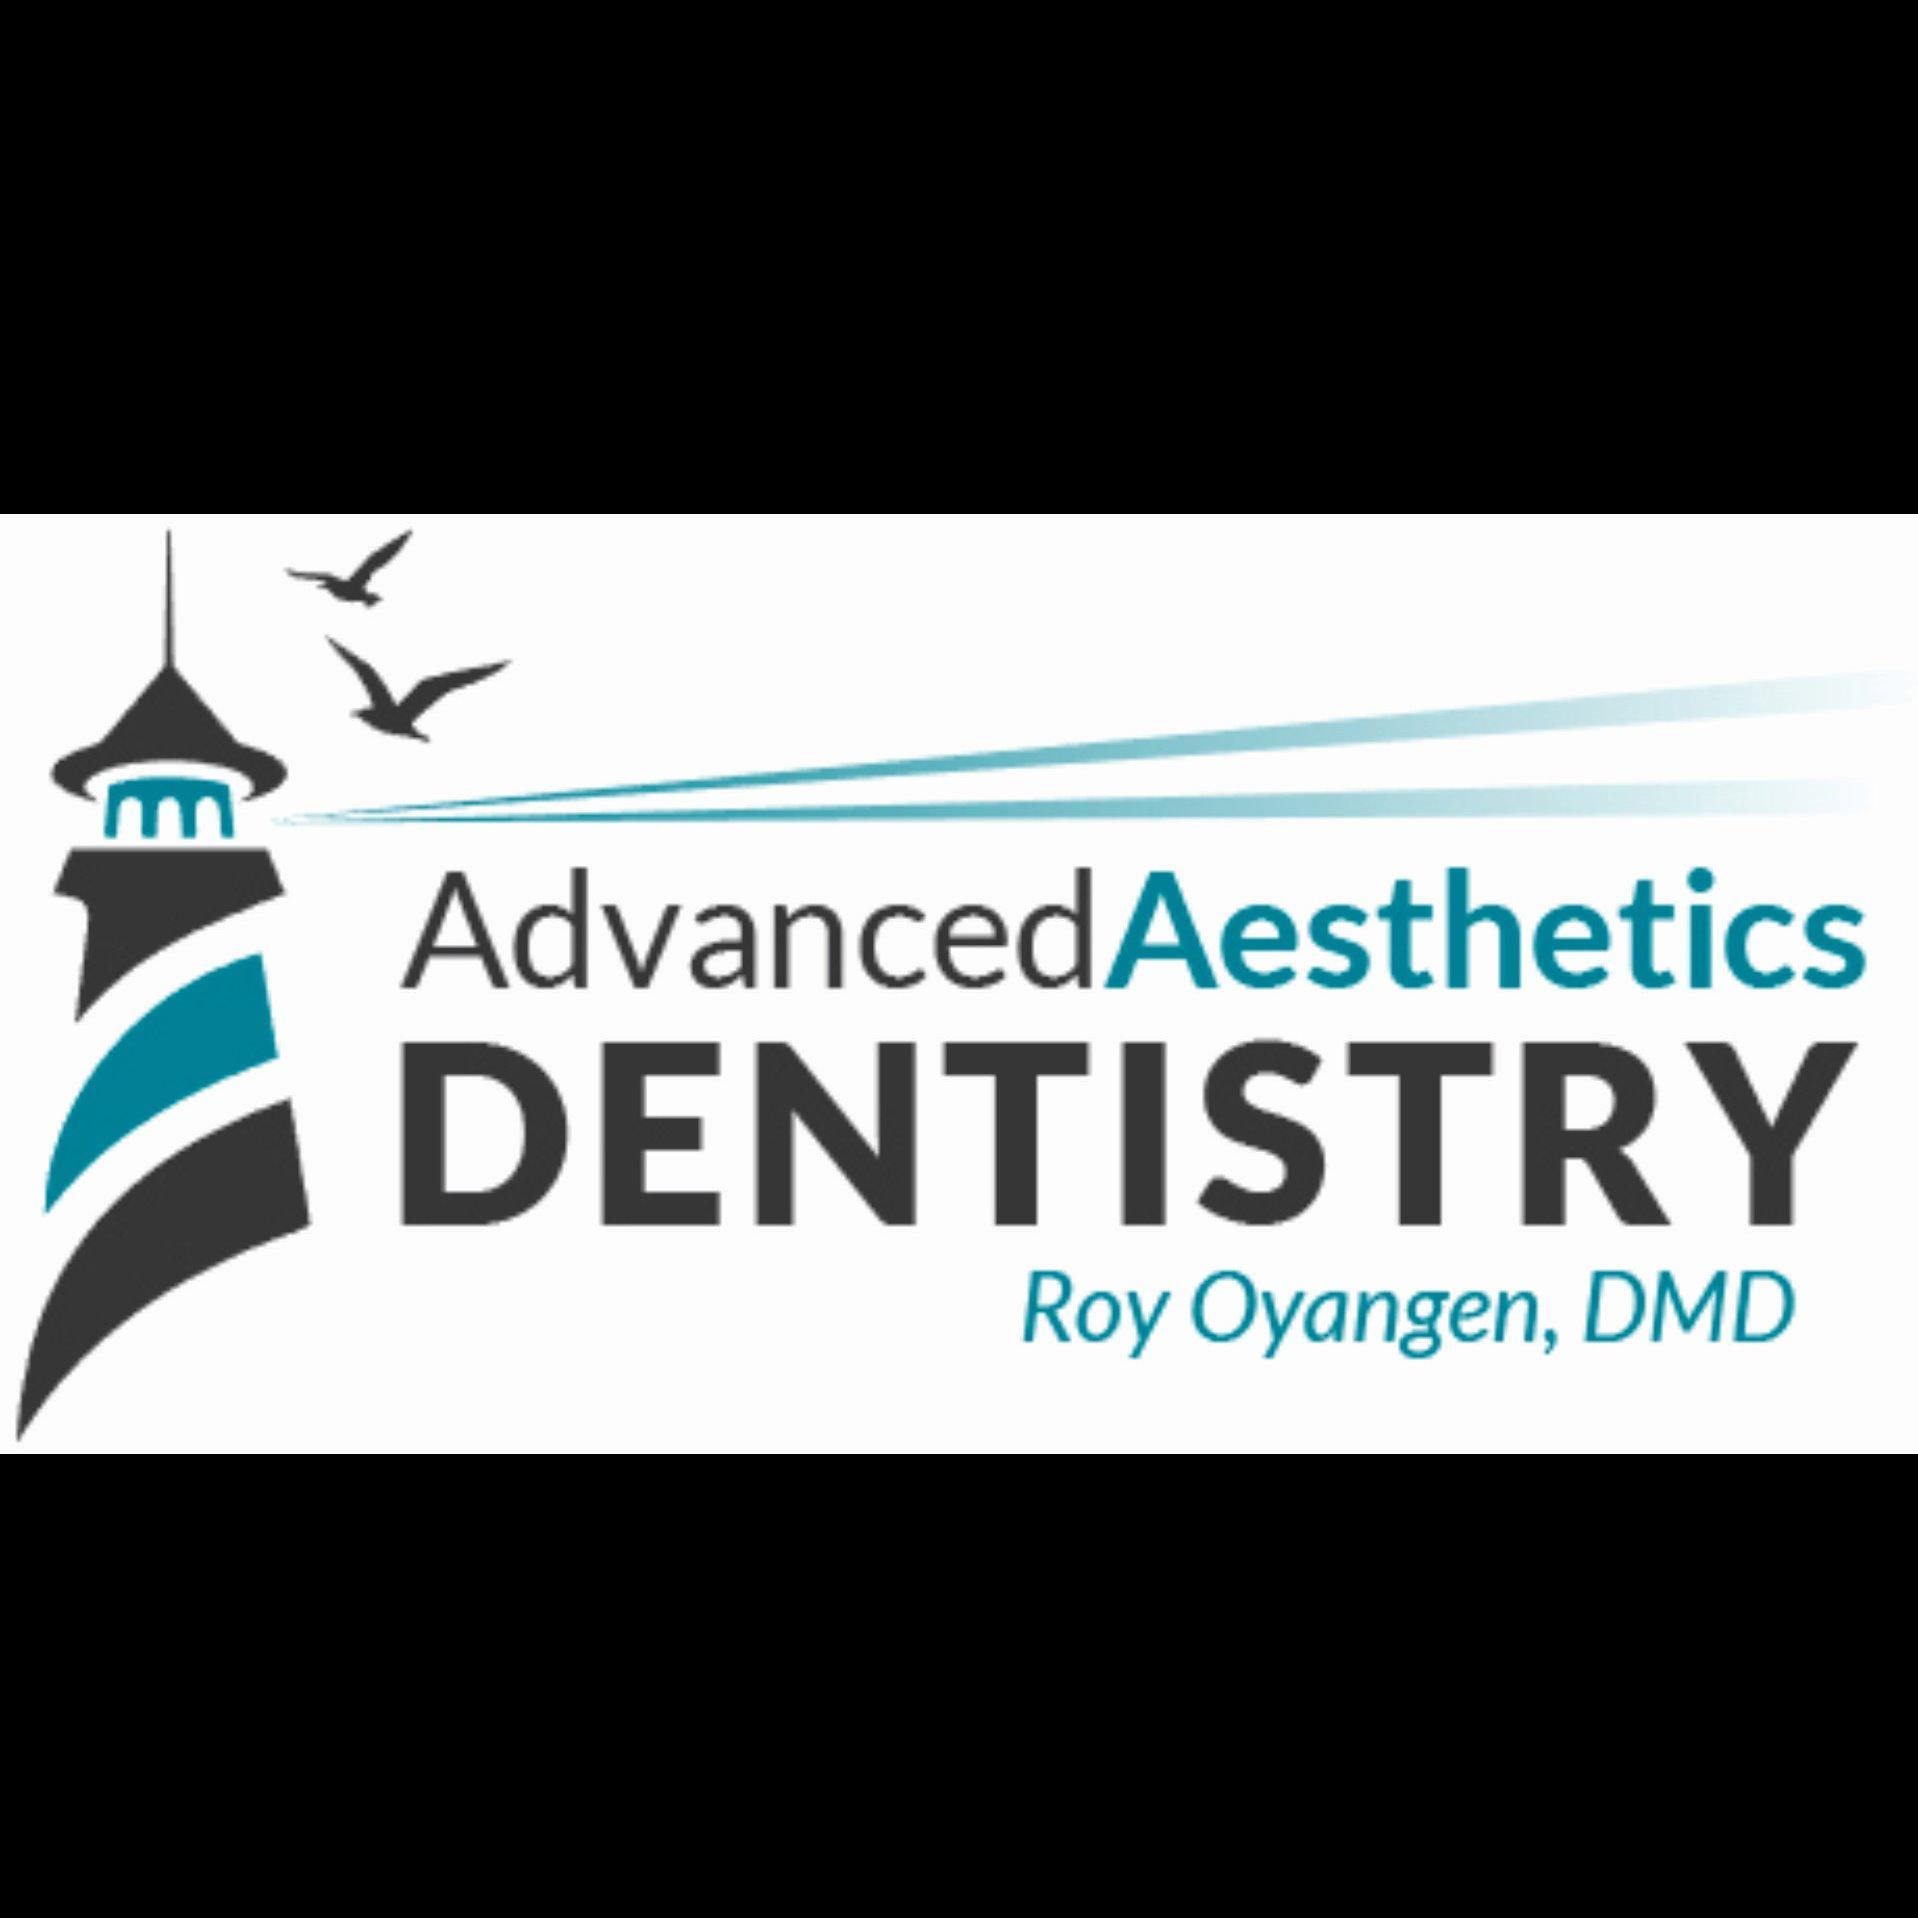 Advanced Aesthetics Dentistry image 3